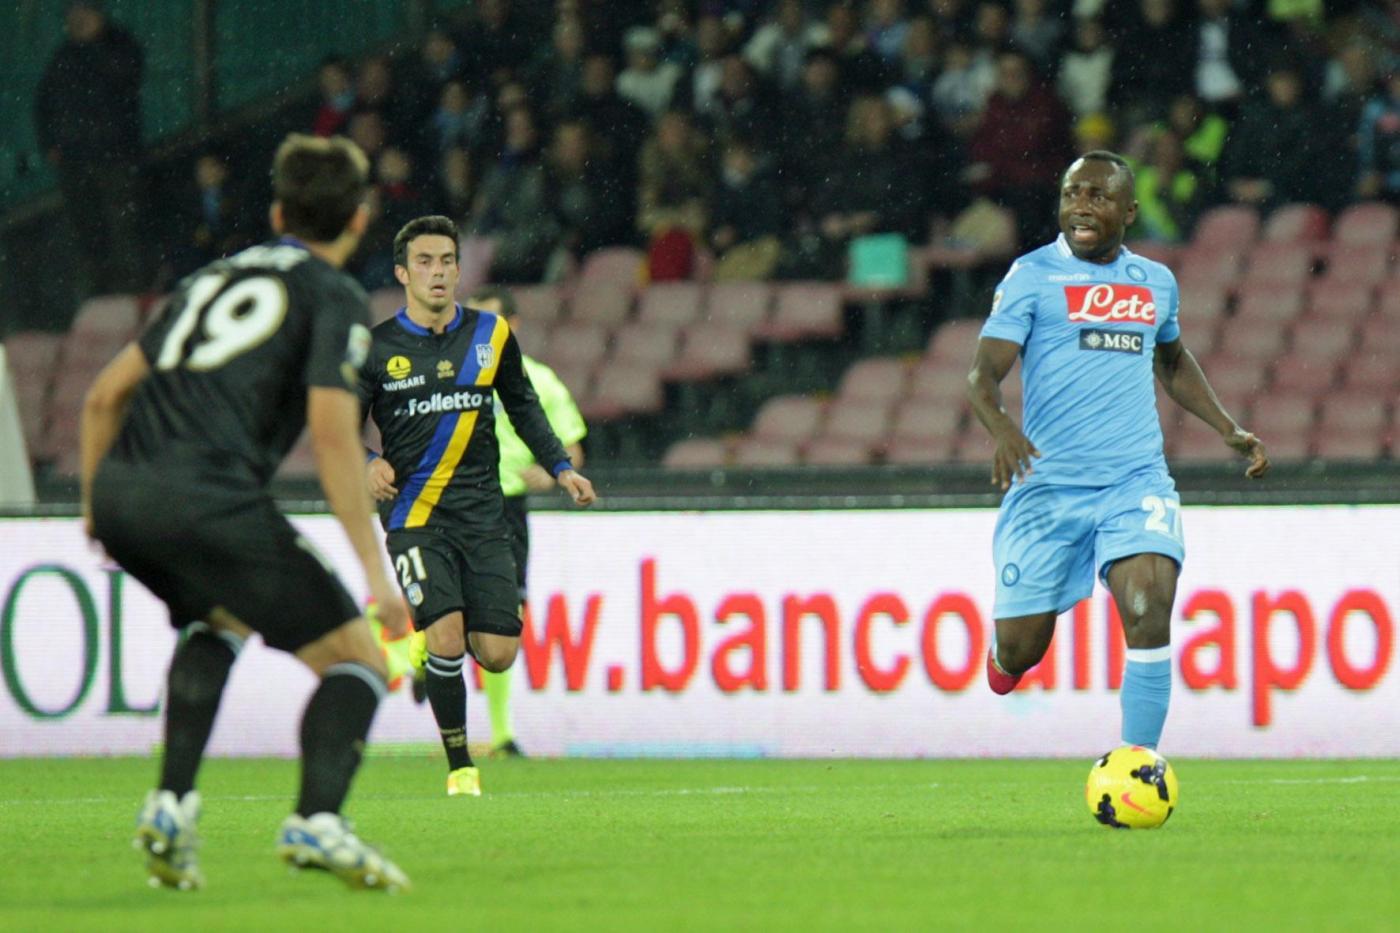 Parma vs Napoli 1-0: gialloblu al quinto posto